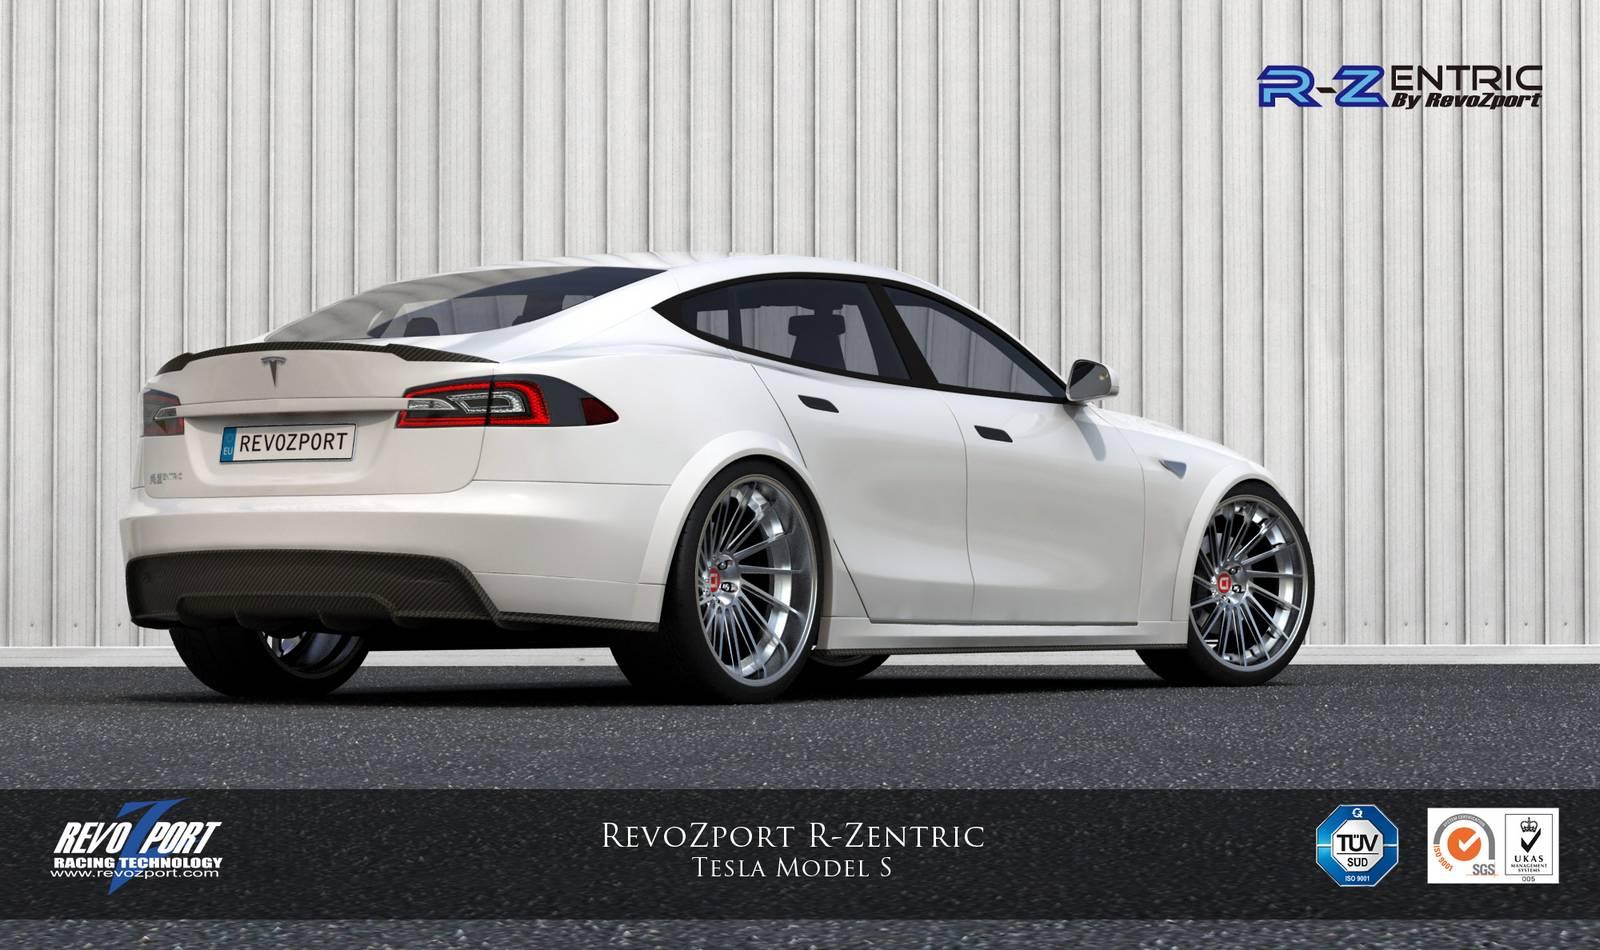 http://www.gtspirit.com/wp-content/uploads/2014/11/Revozport-Tesla-Model-S-5.jpg